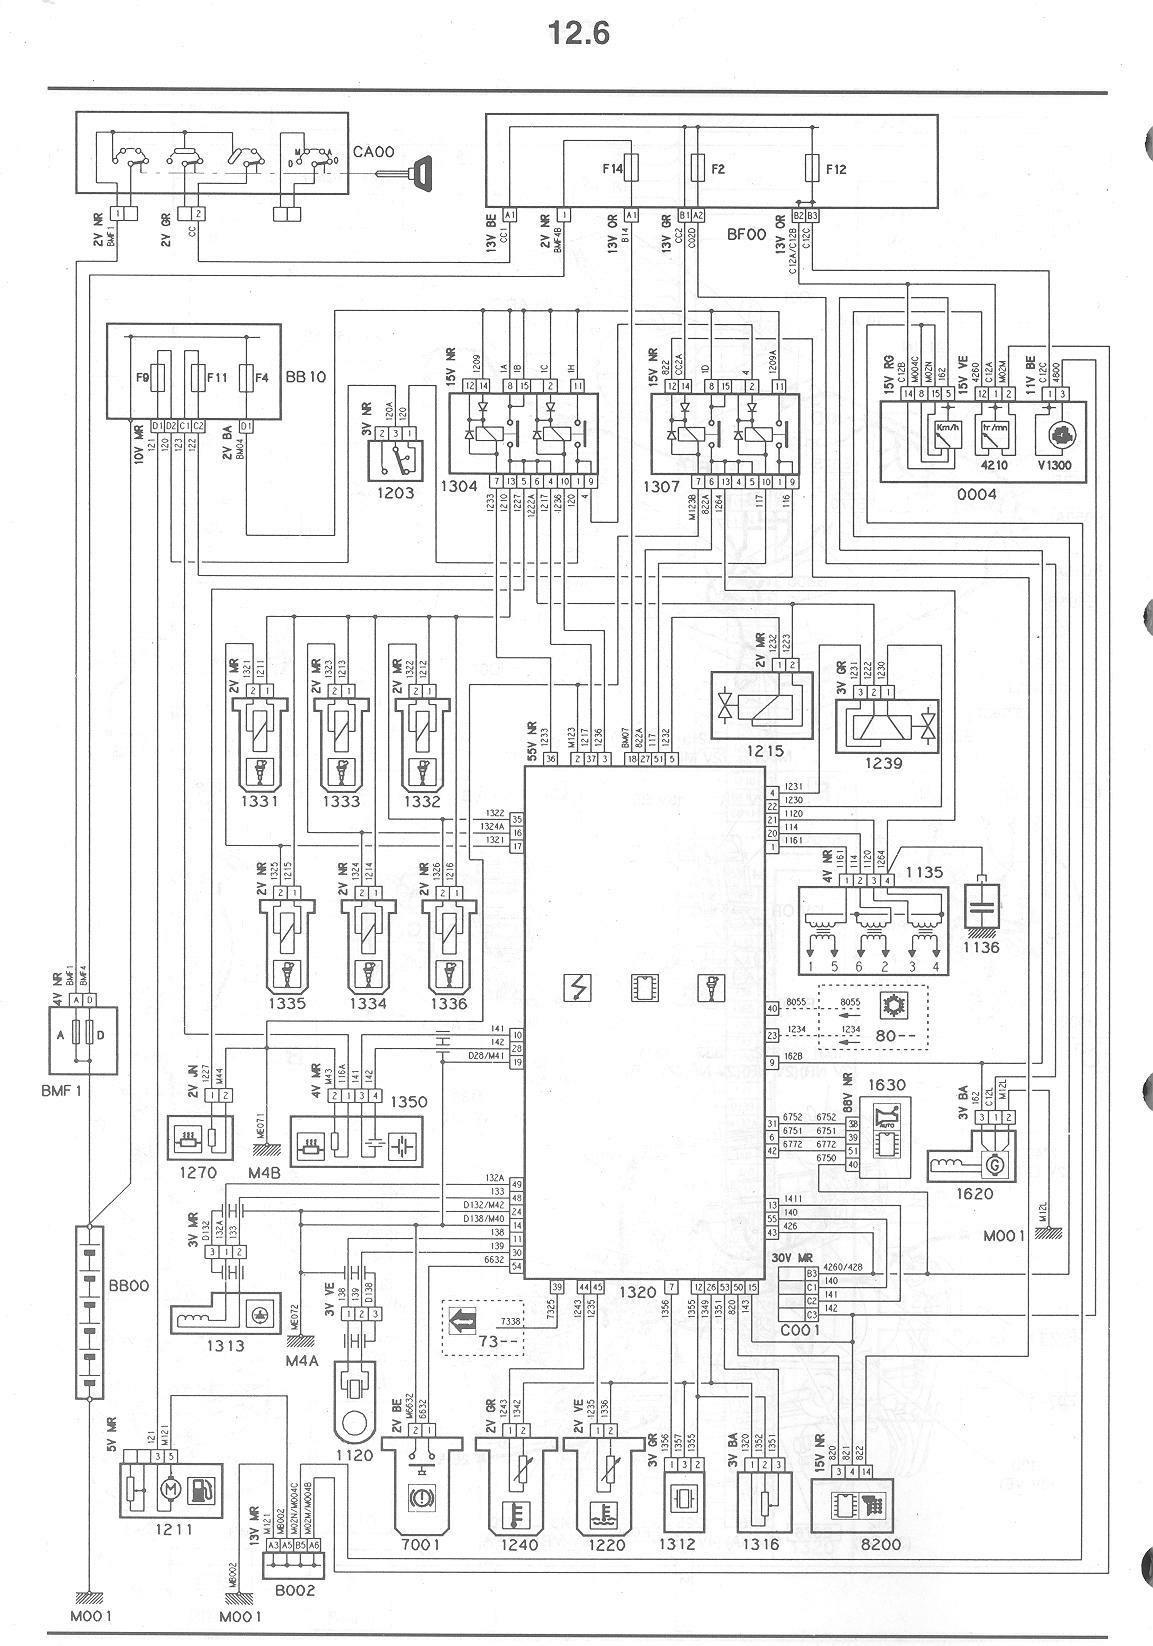 Citroen C8 Wiring Diagram - 86 Toyota Pickup Fuse Box Diagram | Bege Wiring  Diagram | Citroen C4 Bsi Wiring Diagram |  | Bege Place Wiring Diagram